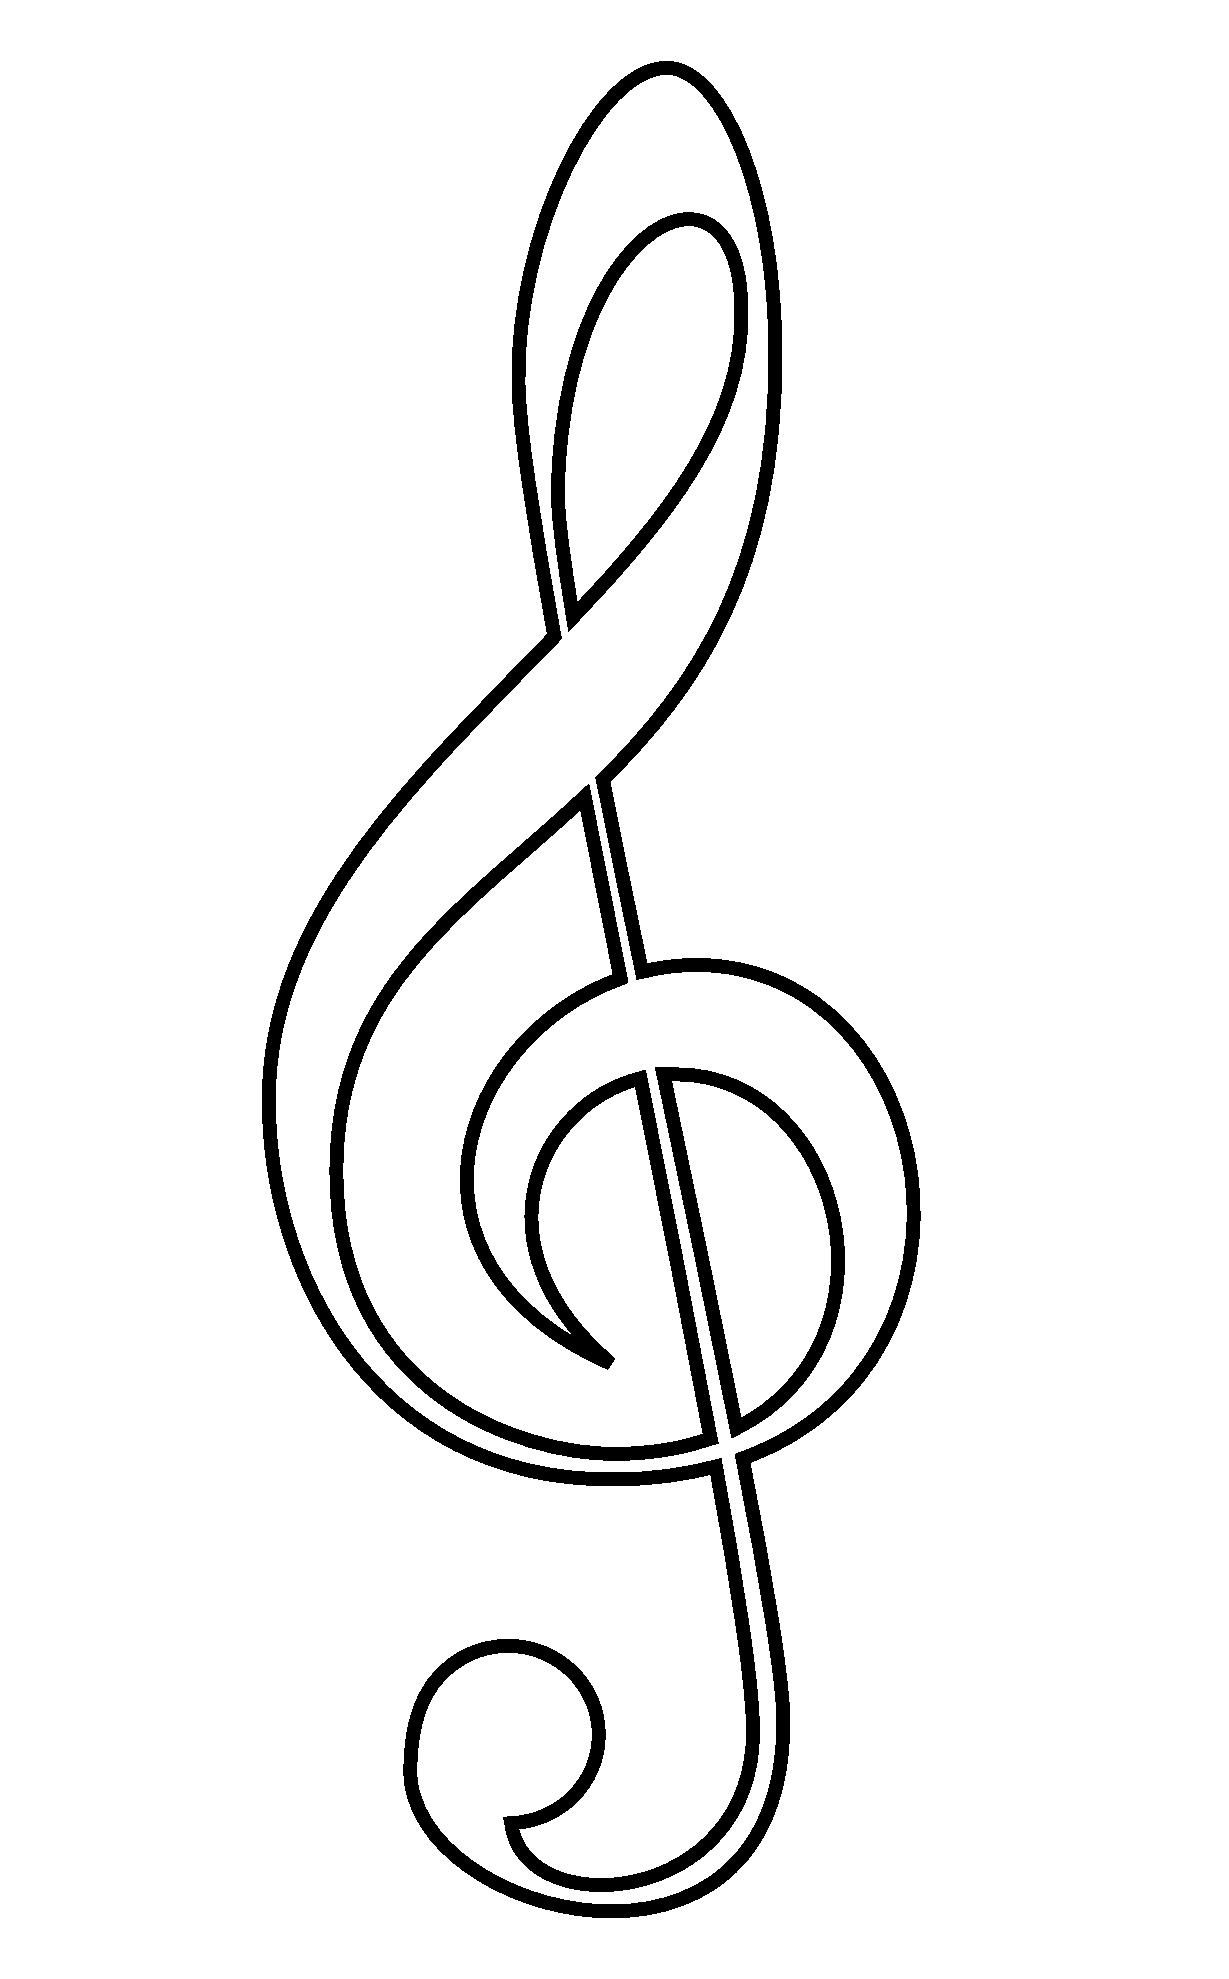 Treble clef and cross clipart royalty free treble clef | rickvanderzwet Treble clef SVG 5(K) | zene | Pinterest ... royalty free